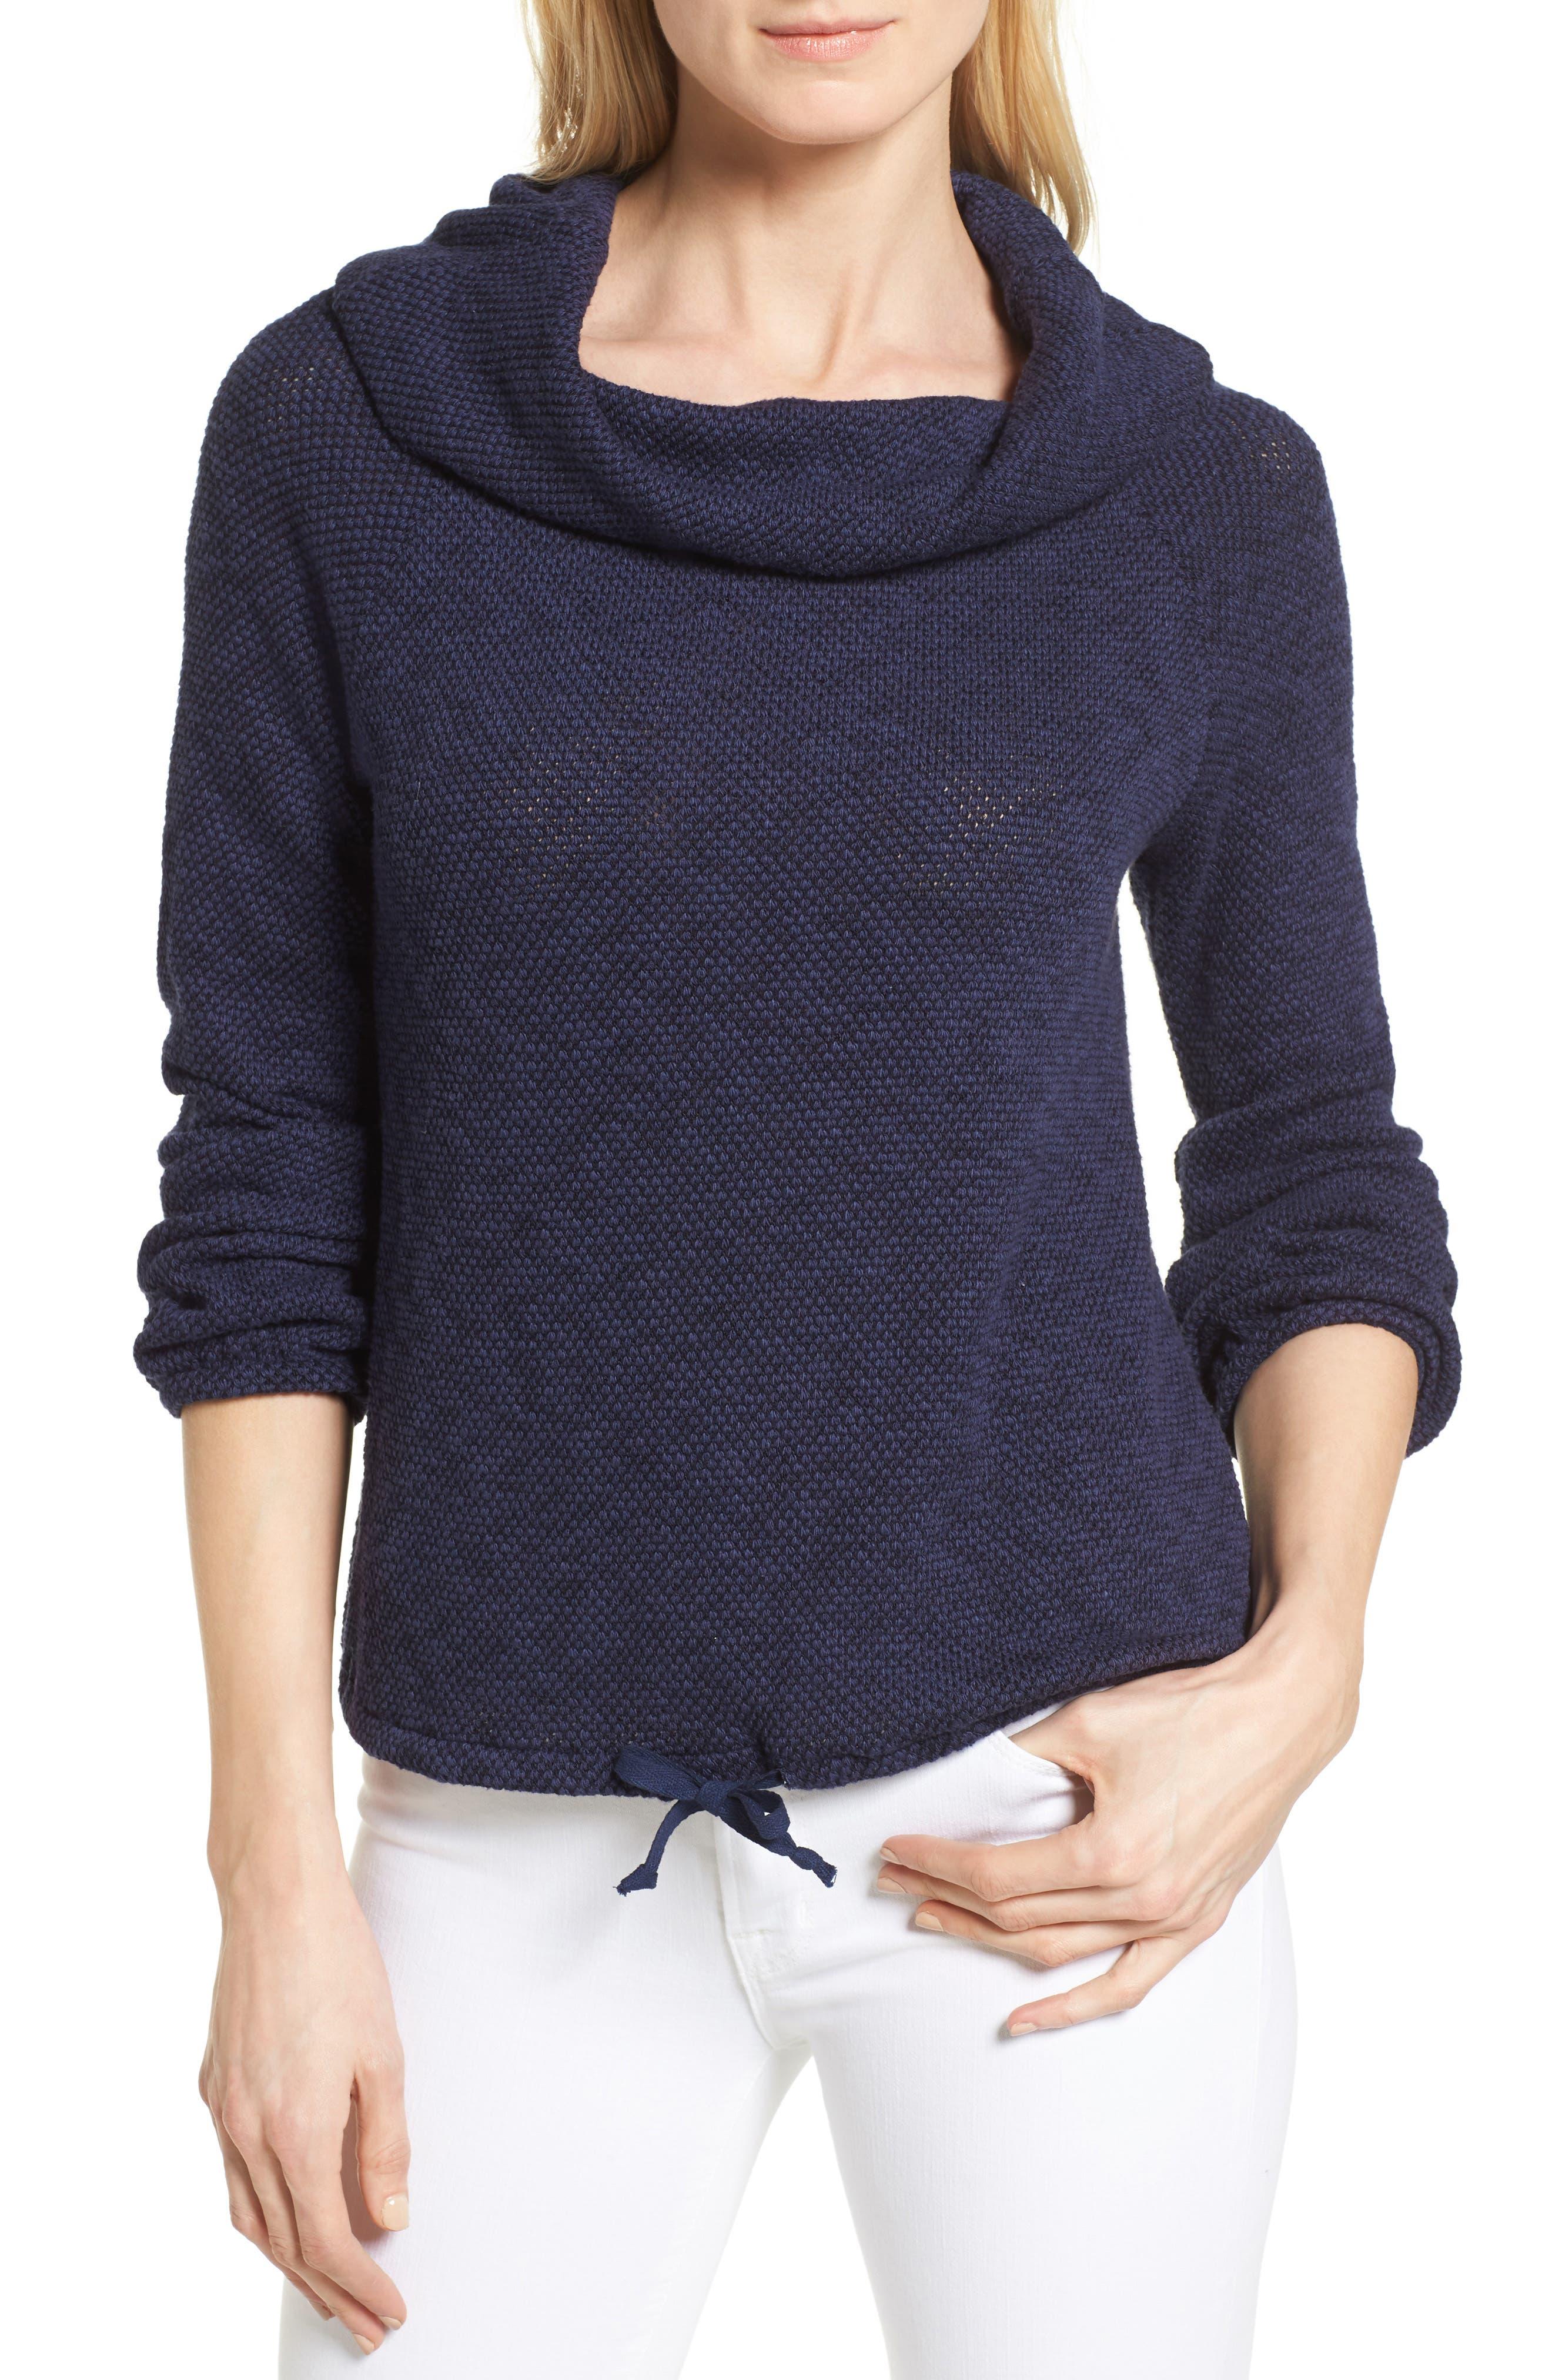 Alternate Image 1 Selected - Caslon® Convertible Off the Shoulder Pullover (Regular & Petite)